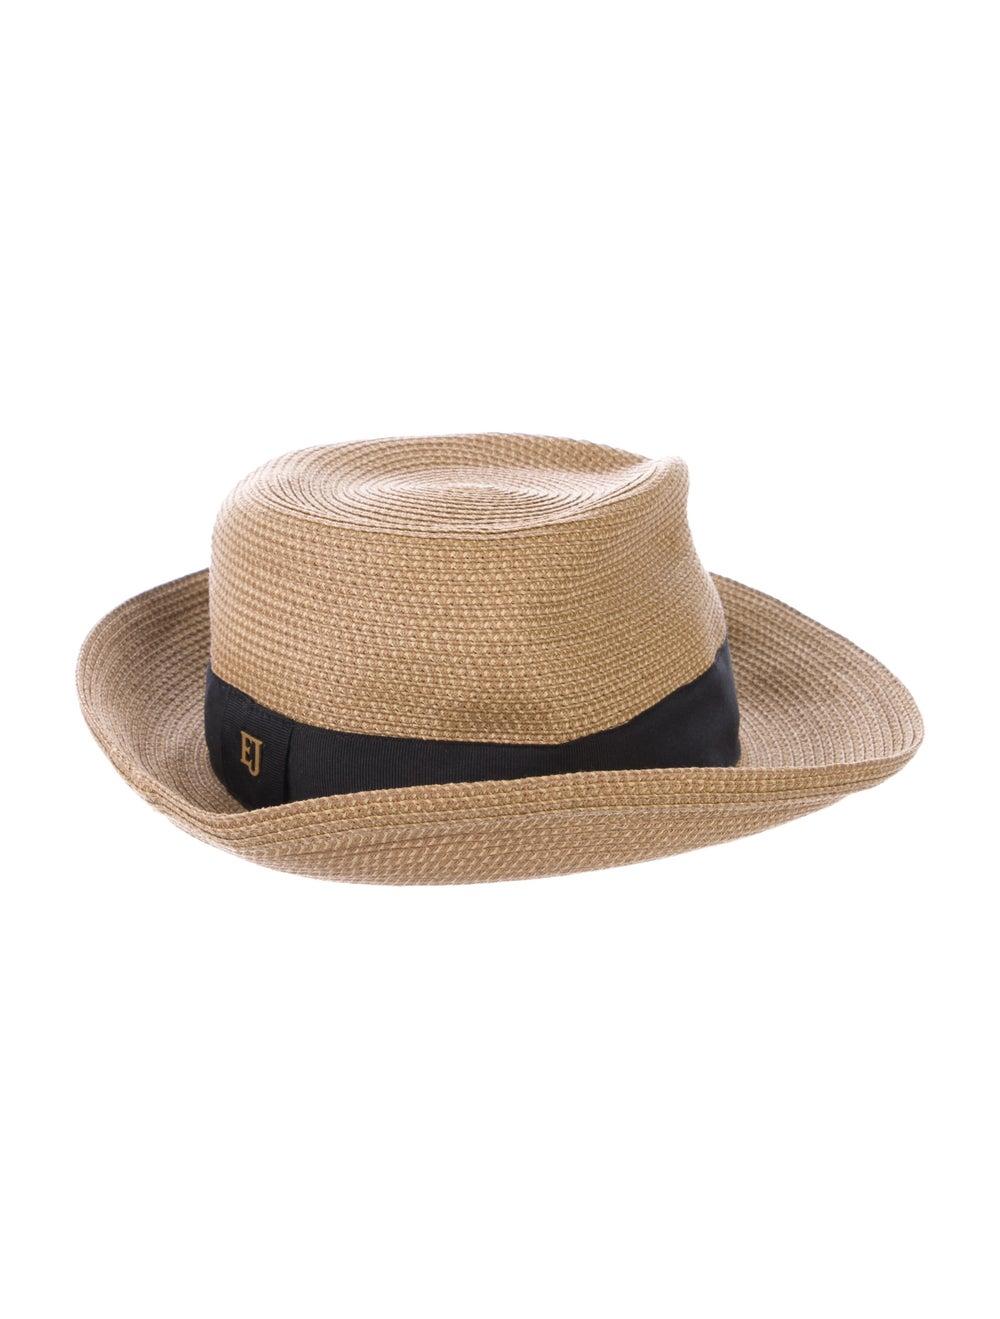 Eric Javits Straw Fedora Hat Natural - image 2